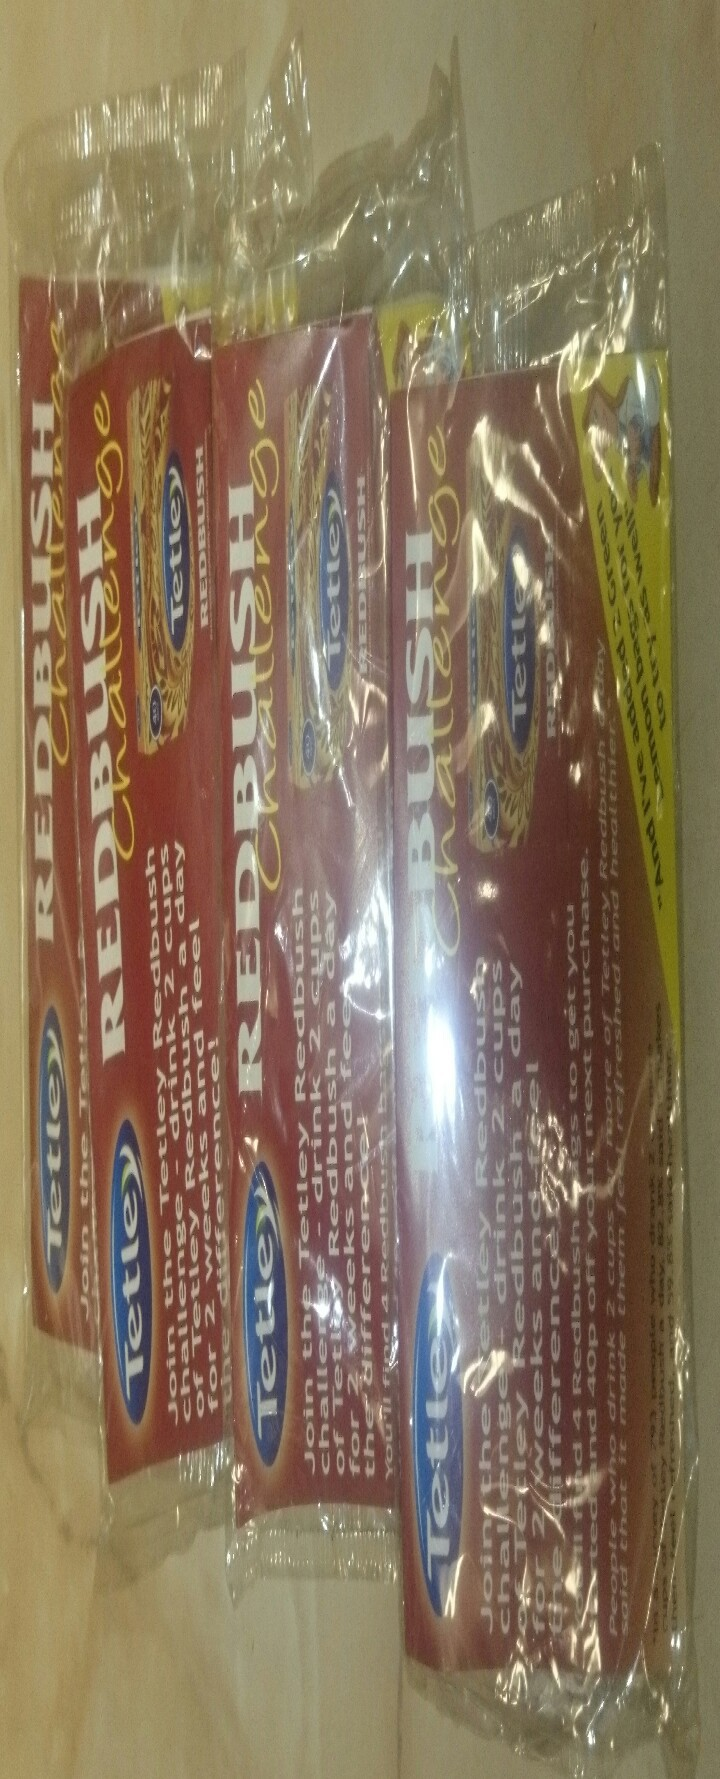 Tetley redbush sample tea bags. 21 packs contains 4 tea bags and green lemon bags as well